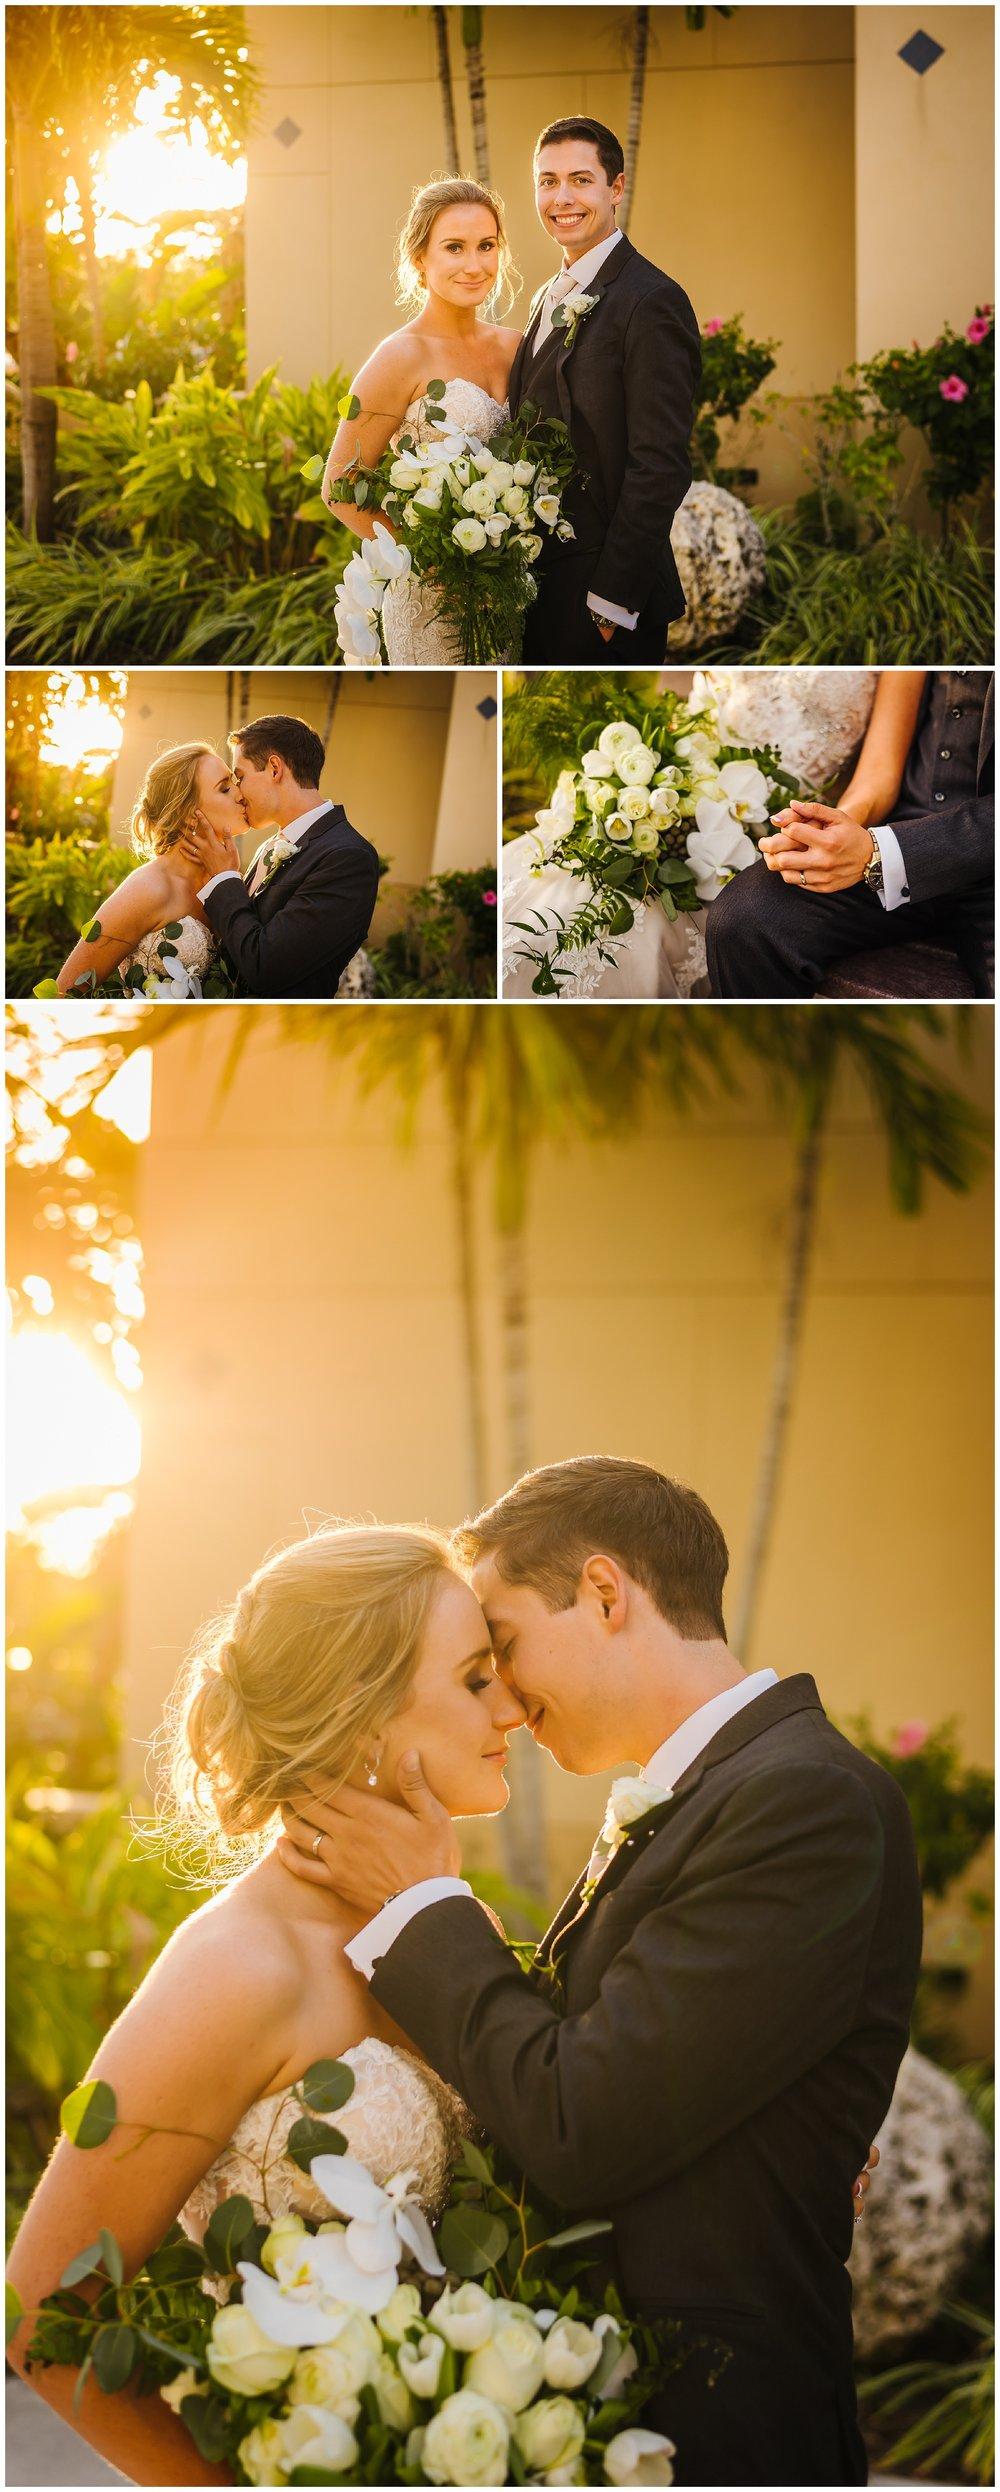 Tampa-wedding-photographer-bella-fleur-orchid-boquet-rsvb-events_0023.jpg